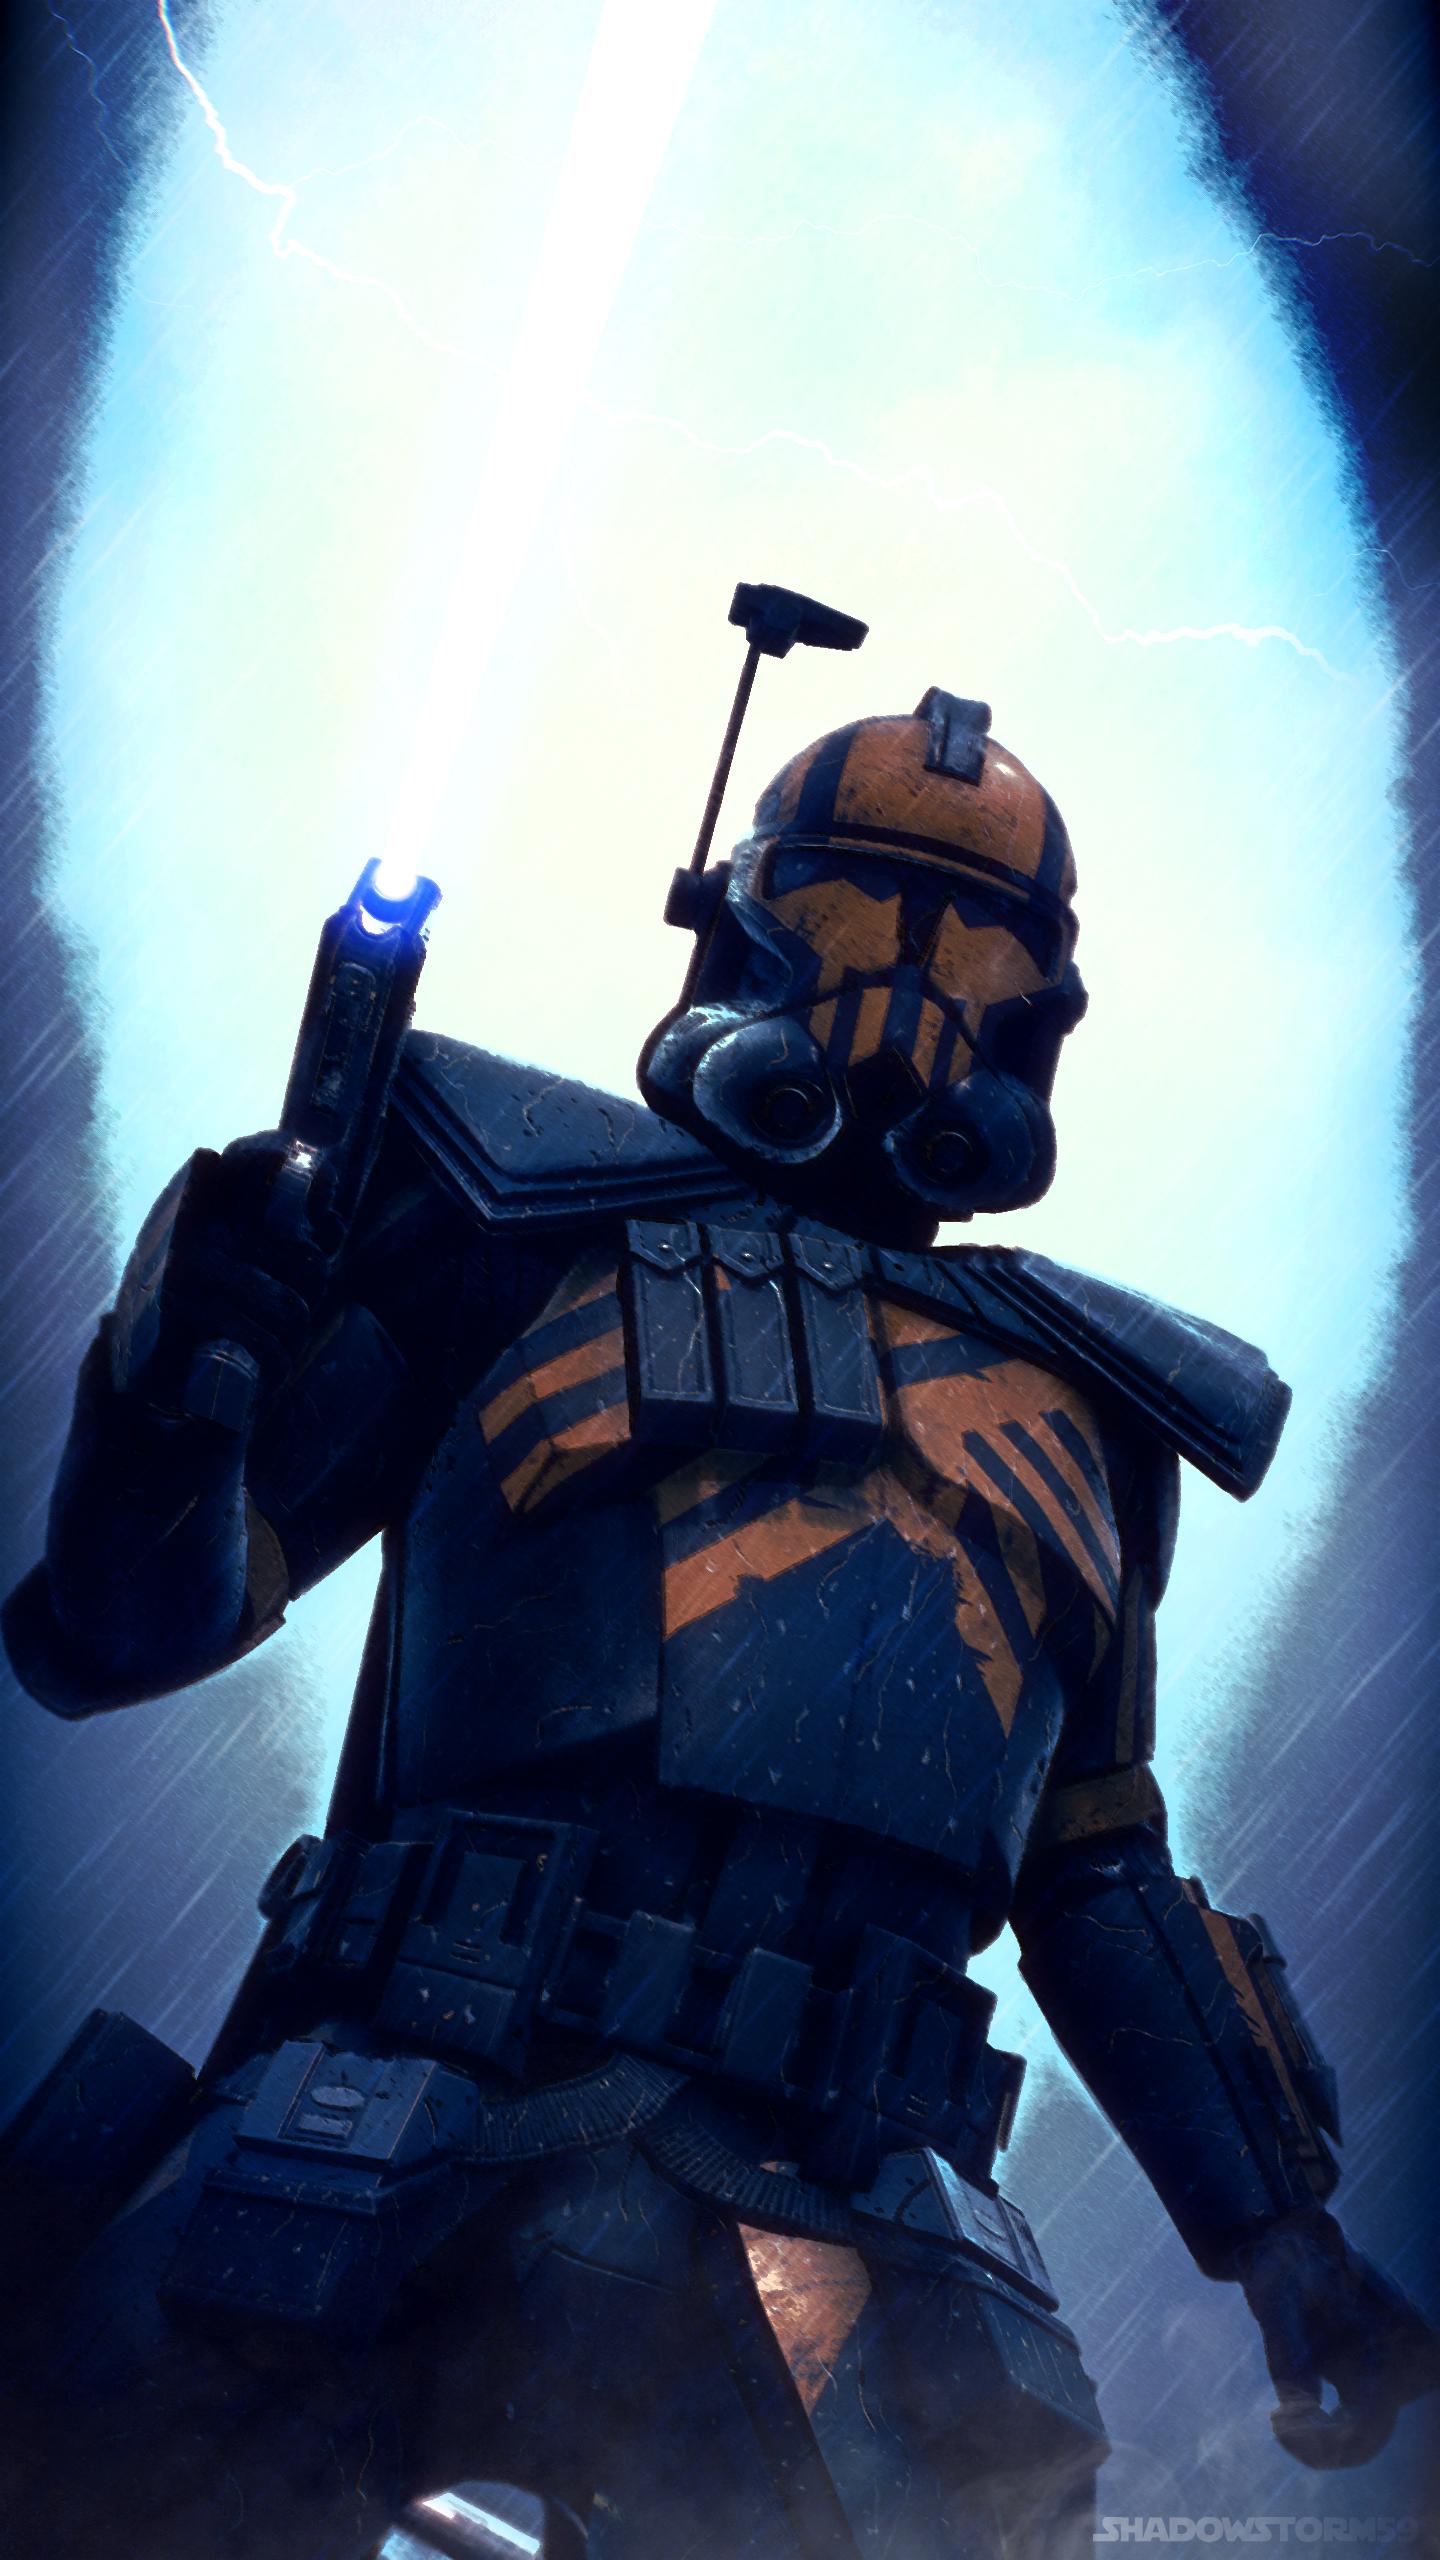 Star Wars Umbra Operative Clone Wallpaper In 2020 Star Wars Trooper Star Wars Images Star Wars Pictures